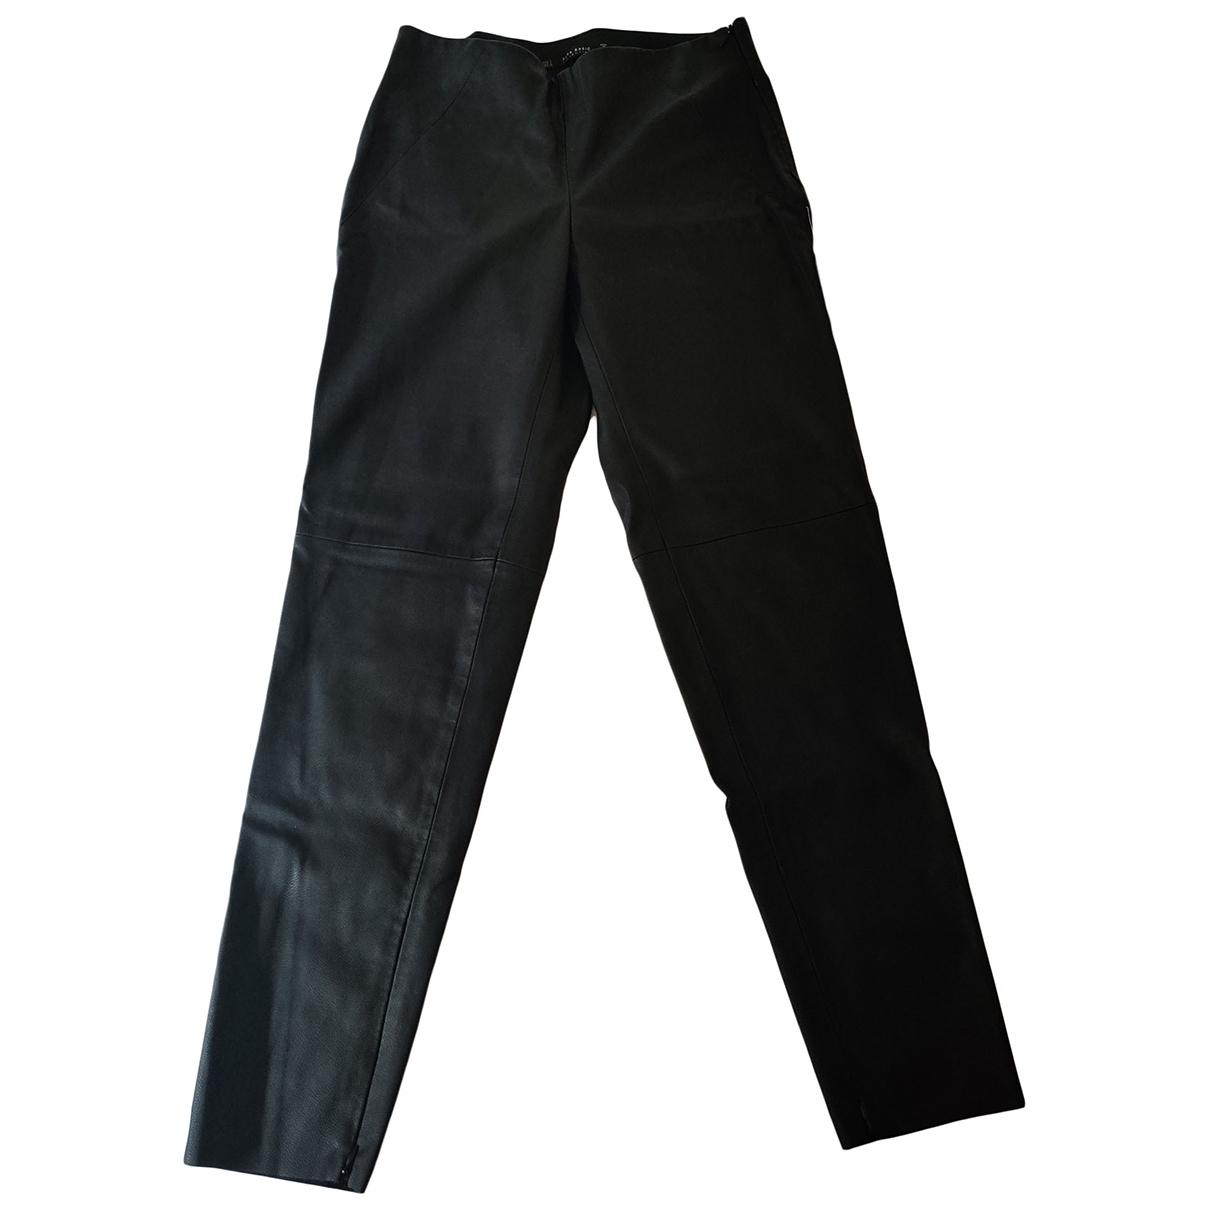 Zara \N Black Leather Trousers for Women S International